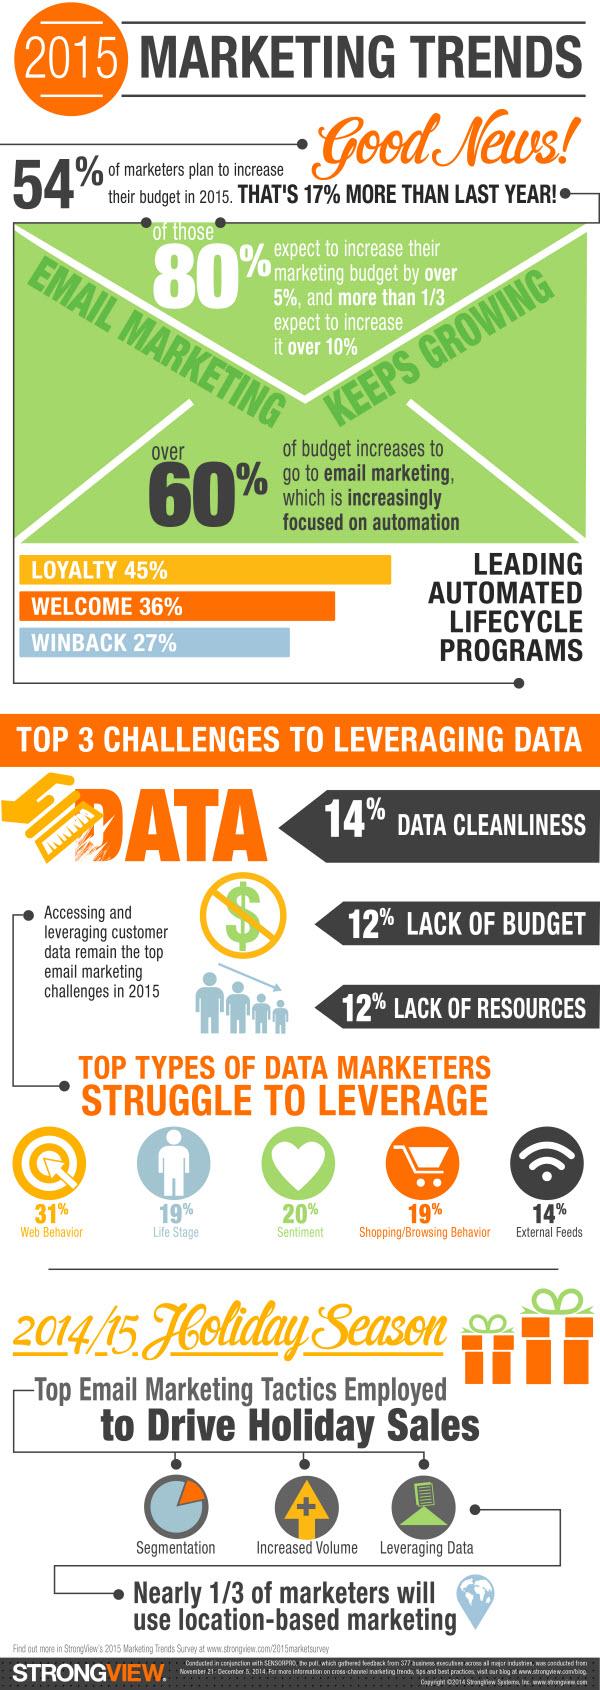 strongview_2015_marketing_trends_blog